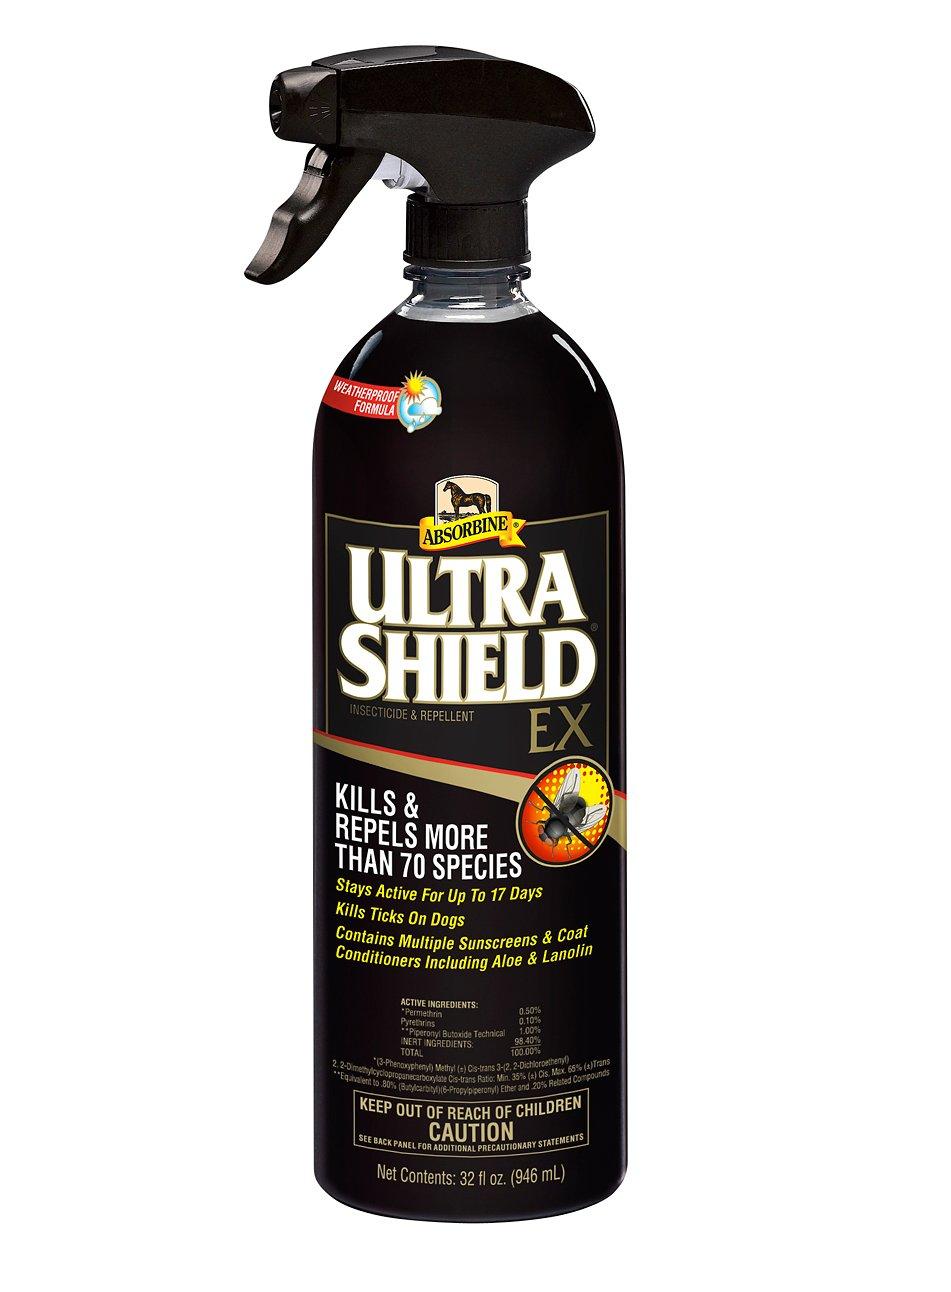 Absorbine 32 Fl Oz Ultra Shield EX Fly Spray Kills and Repels More Than 70 Species ! Weatherproof Formula